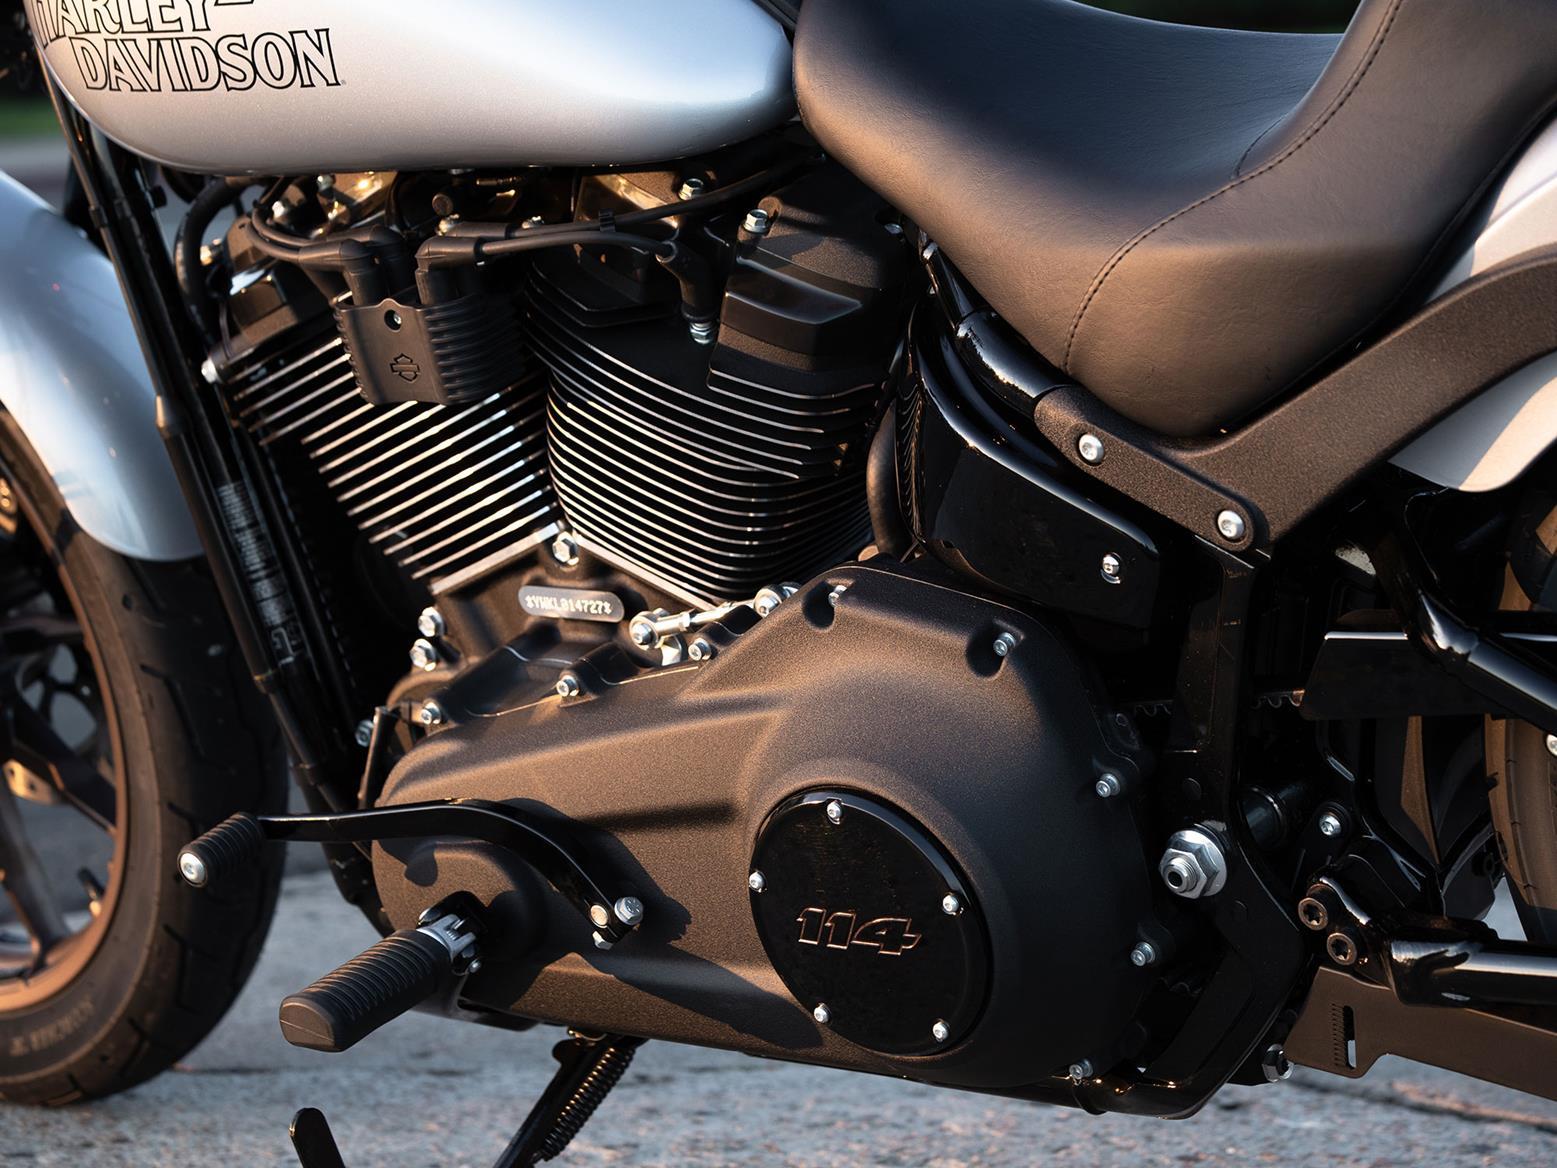 Harley-Davidson Lowrider S left peg